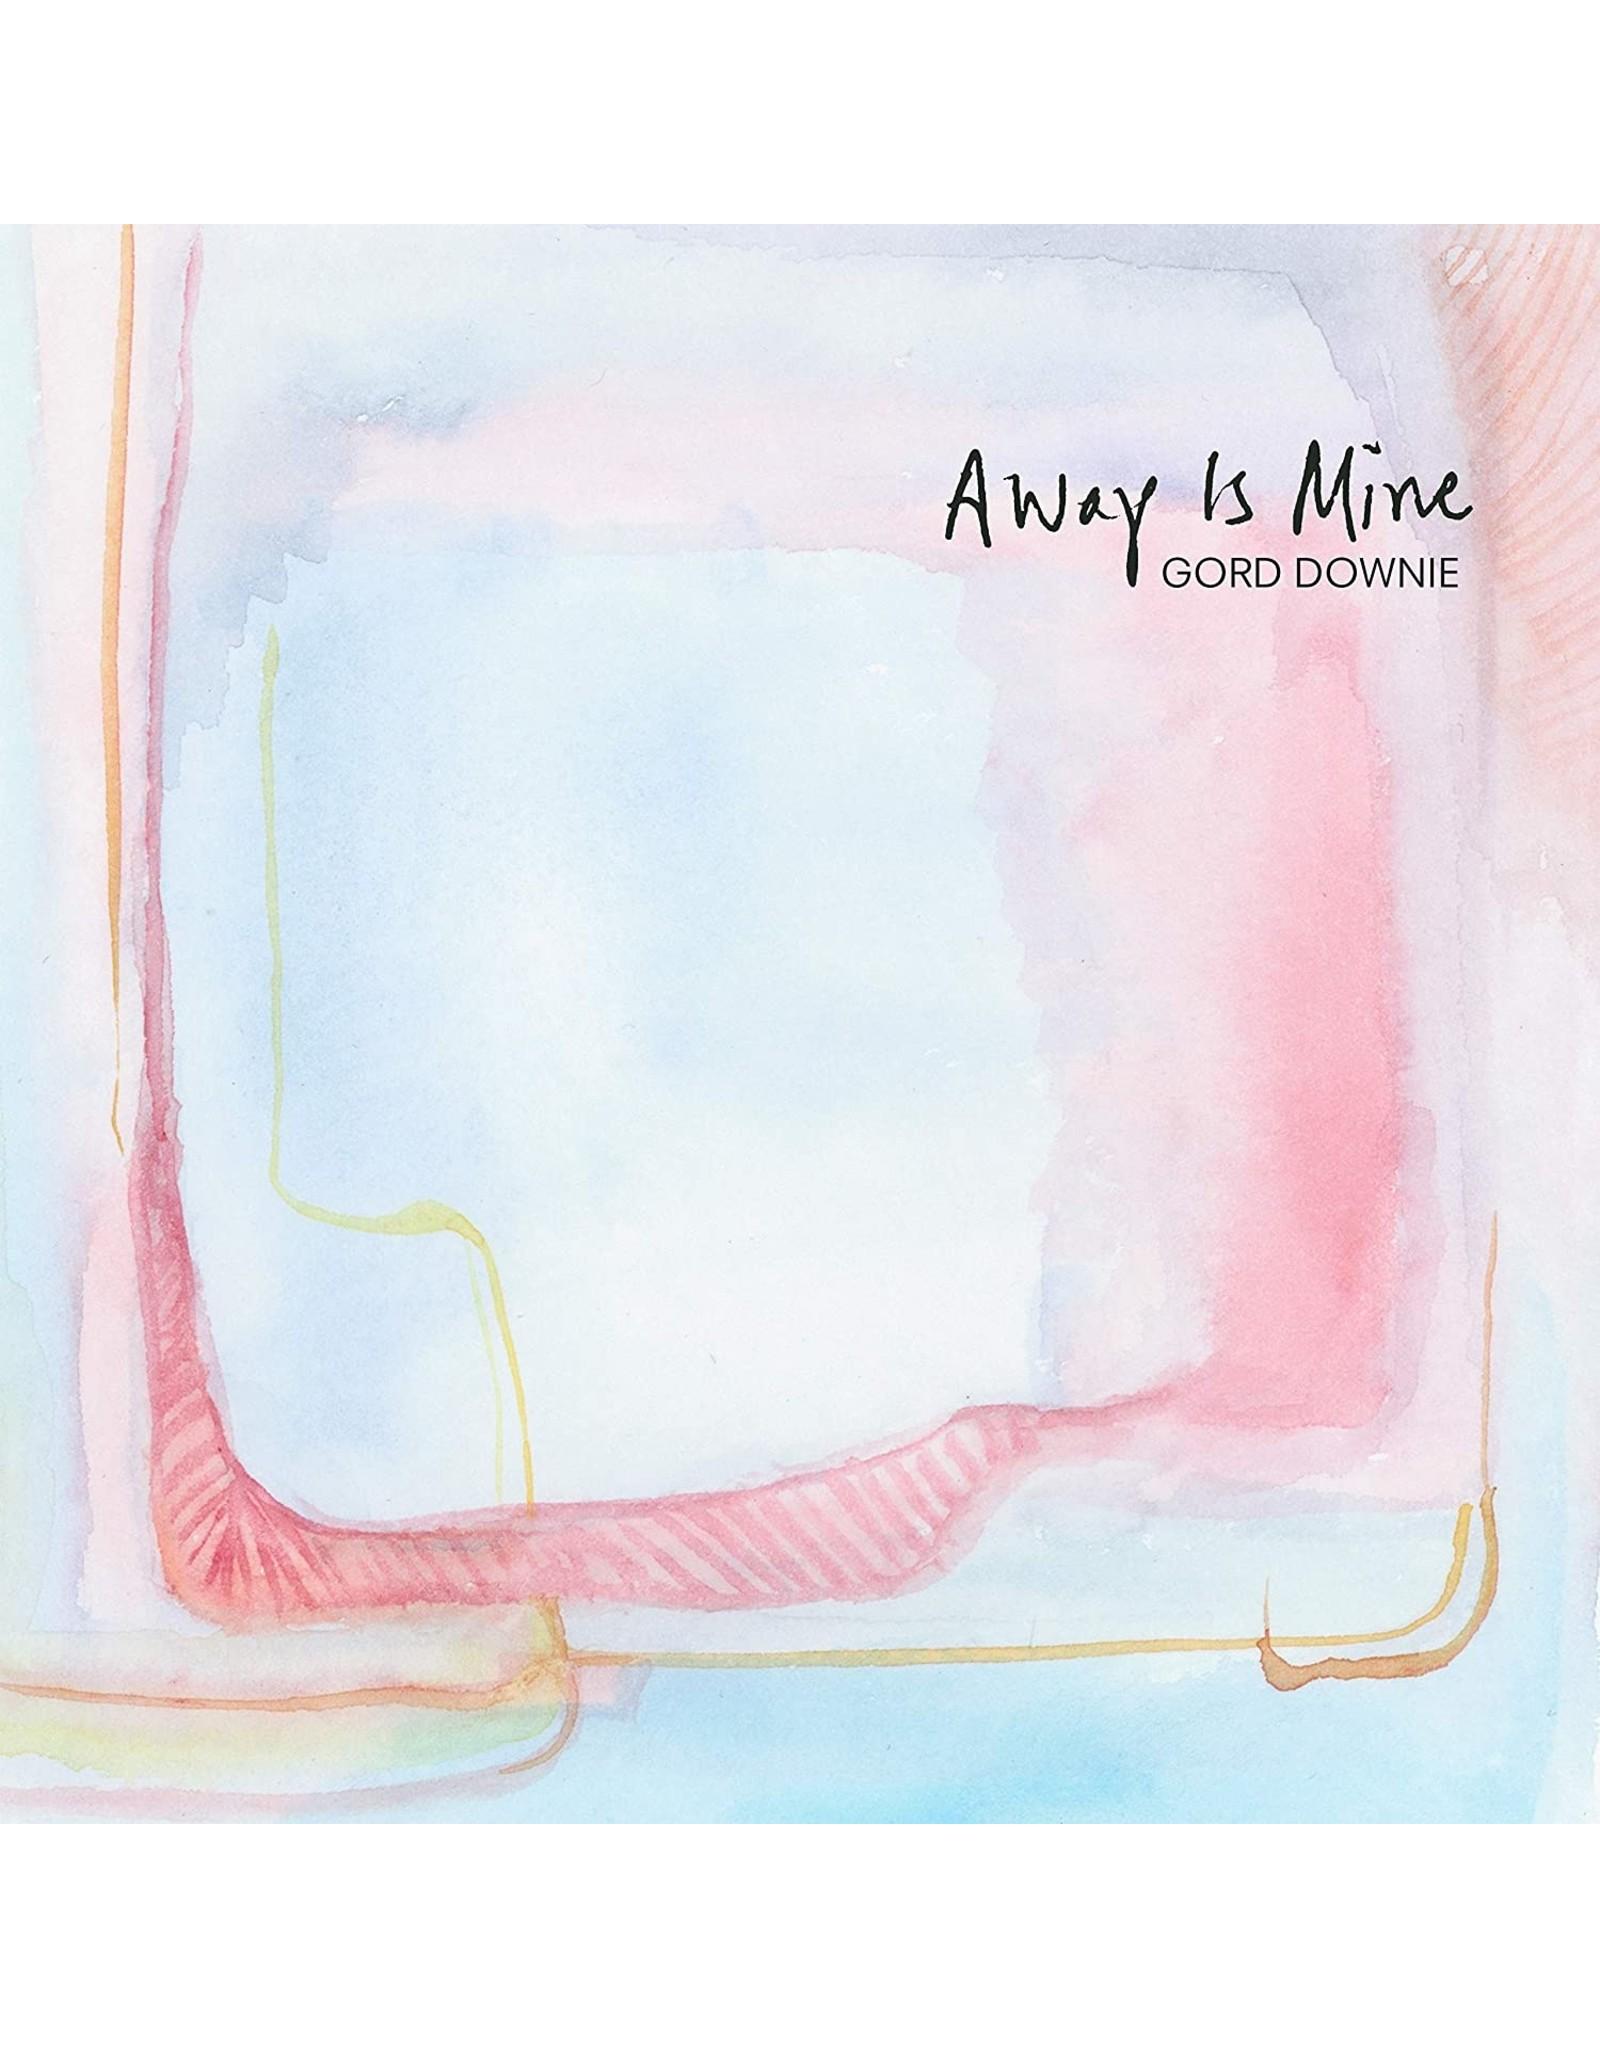 Gord Downie - Away Is Mine (Deluxe Vinyl)